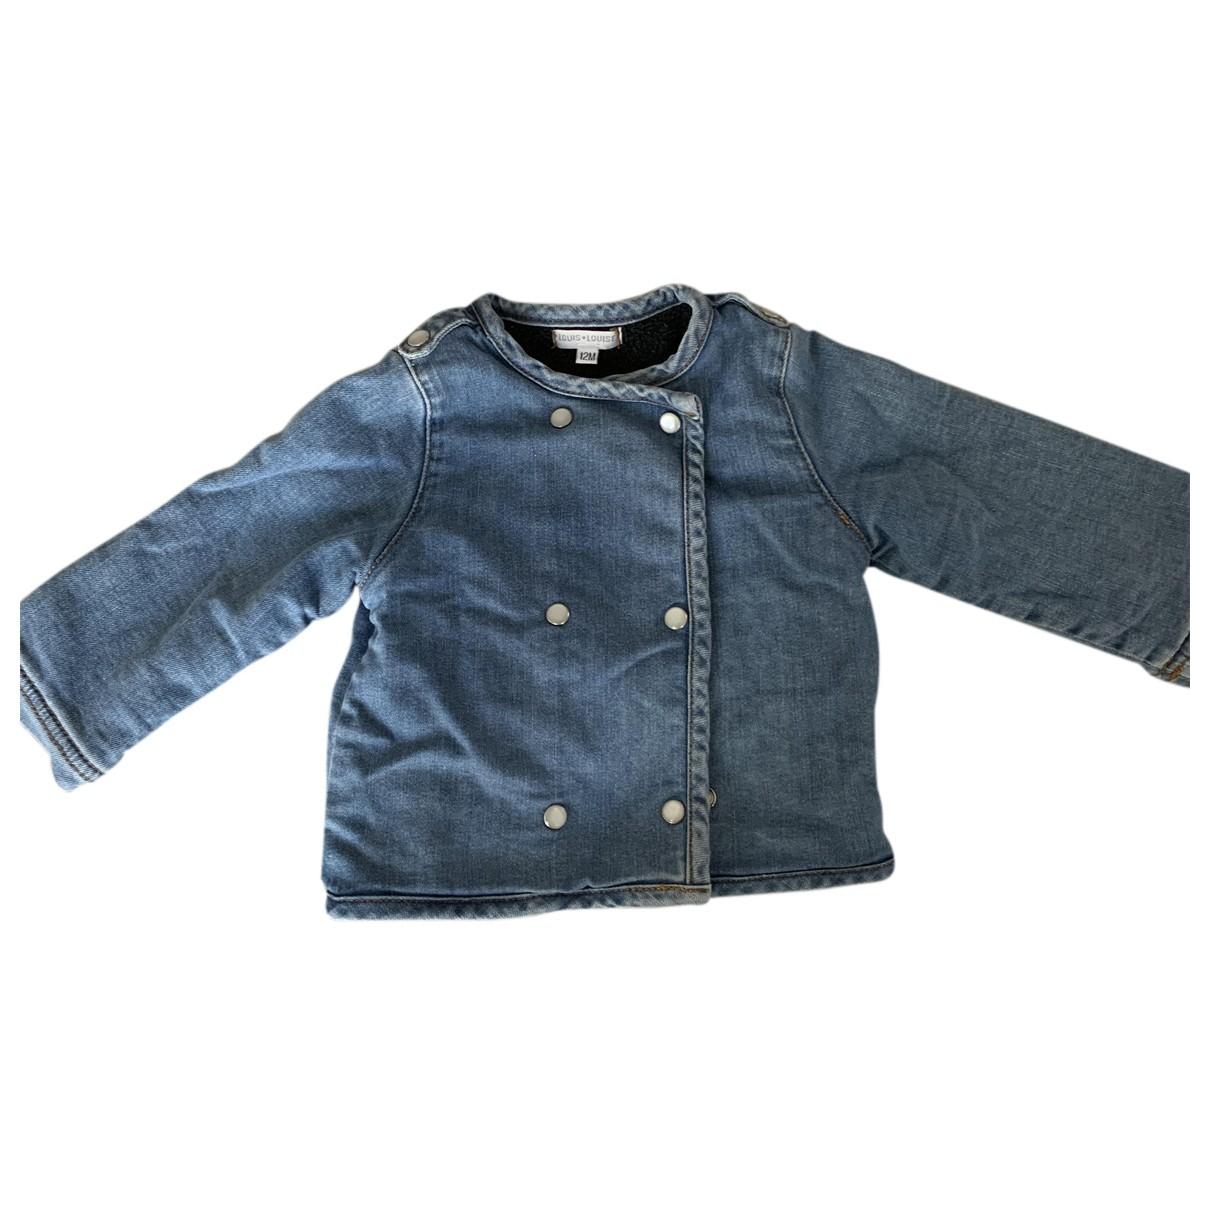 Louis Louise \N Jacke, Maentel in  Blau Denim - Jeans